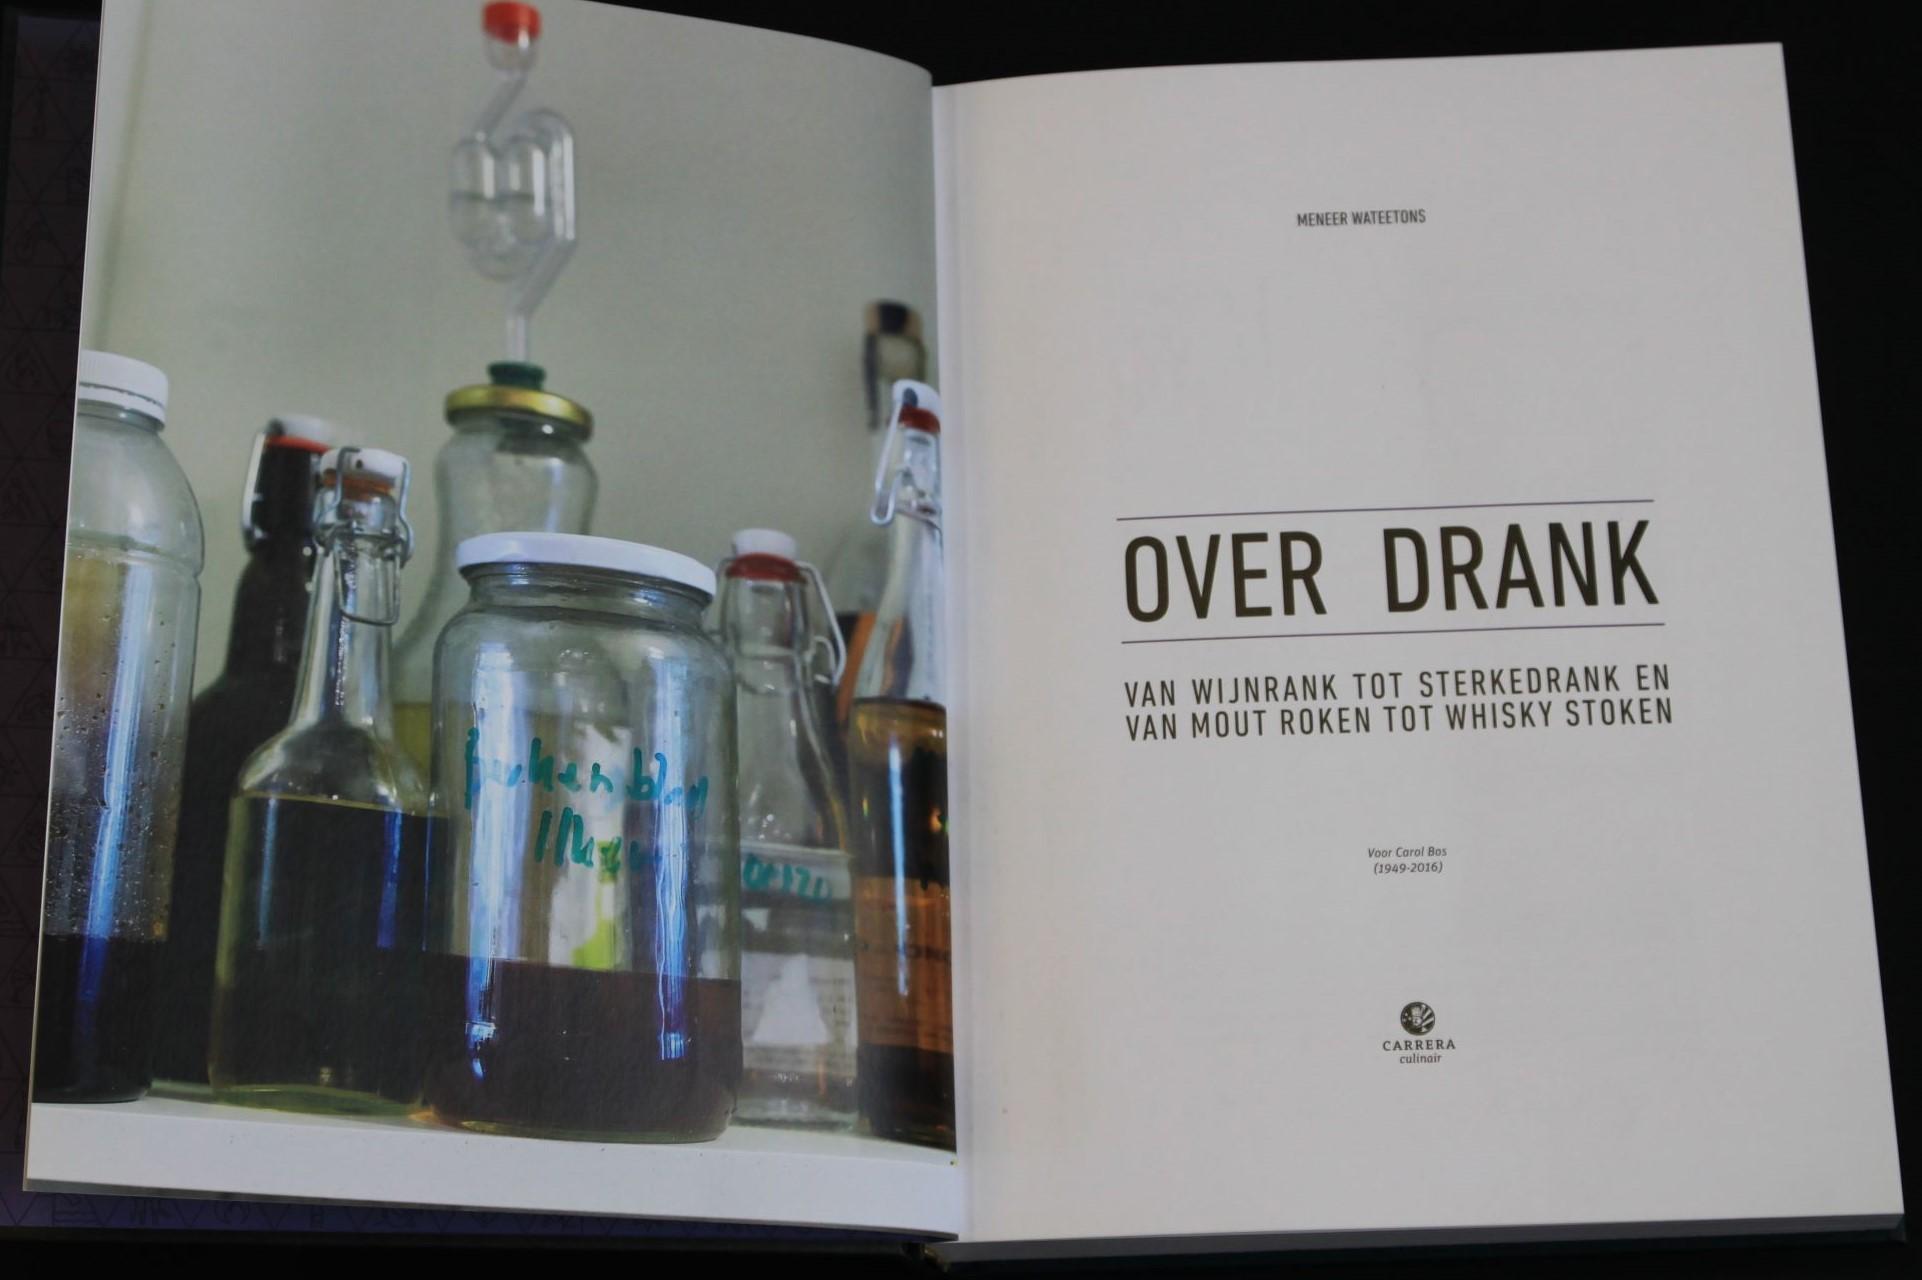 Boek over drank | drank stoken